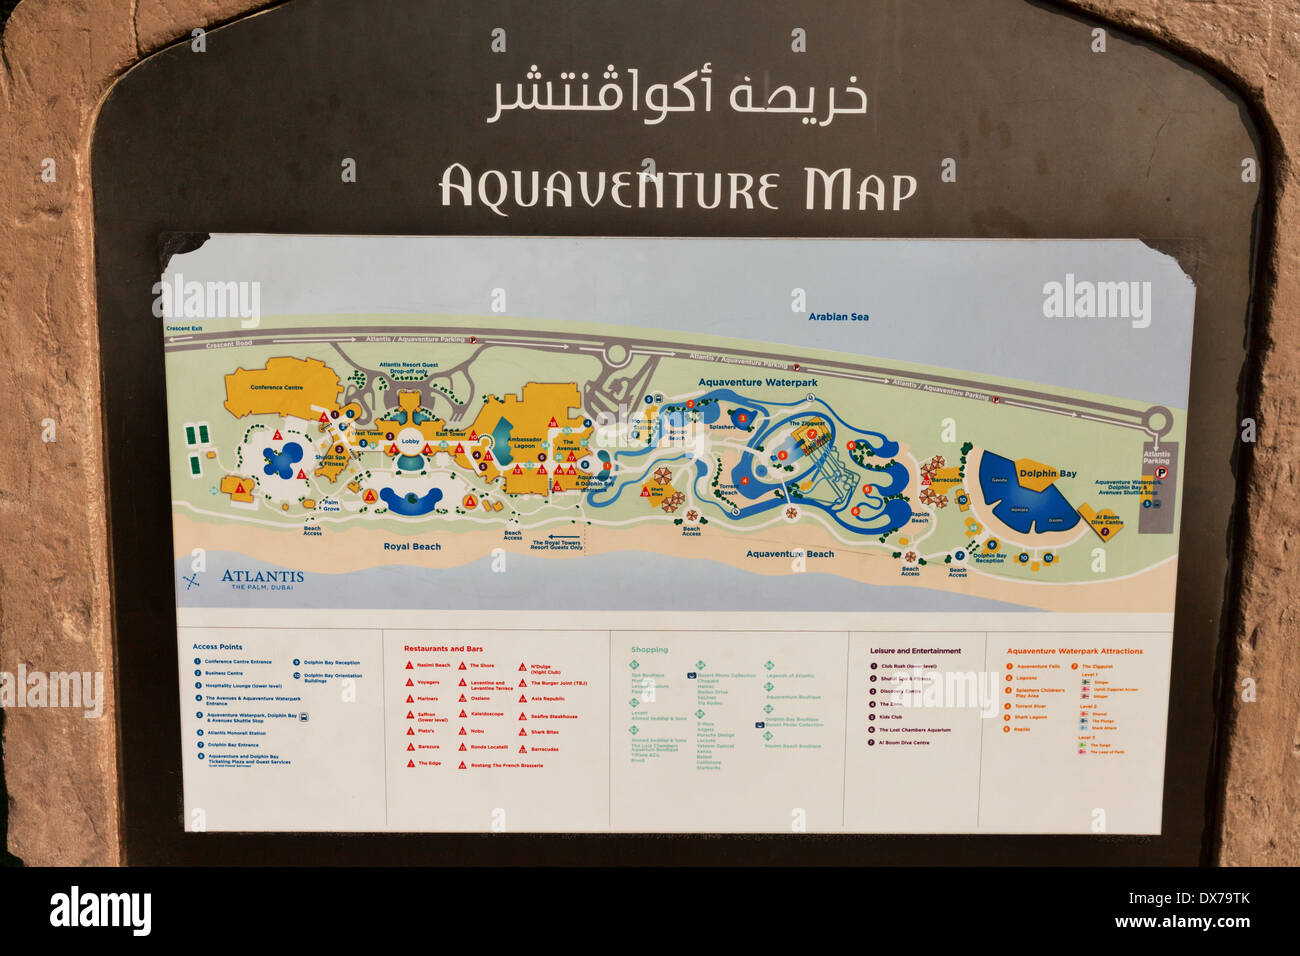 Aquaventure map atlantis hotel waterpark dubai uae united arab aquaventure map atlantis hotel waterpark dubai uae united arab emirates middle east gumiabroncs Choice Image